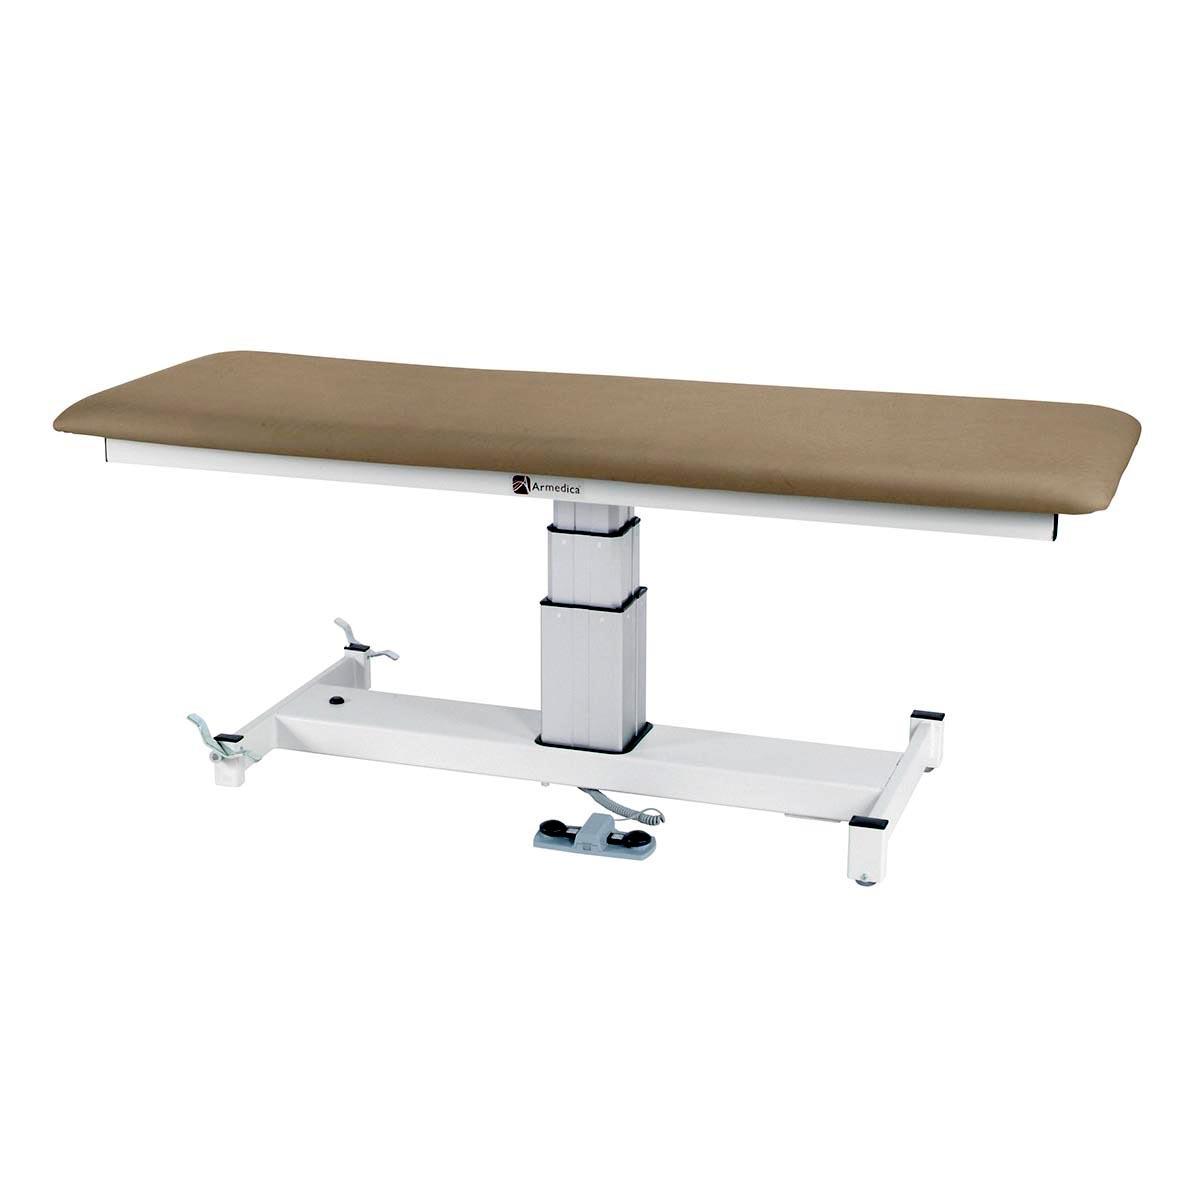 Armedica AM-SP 100 treatment table